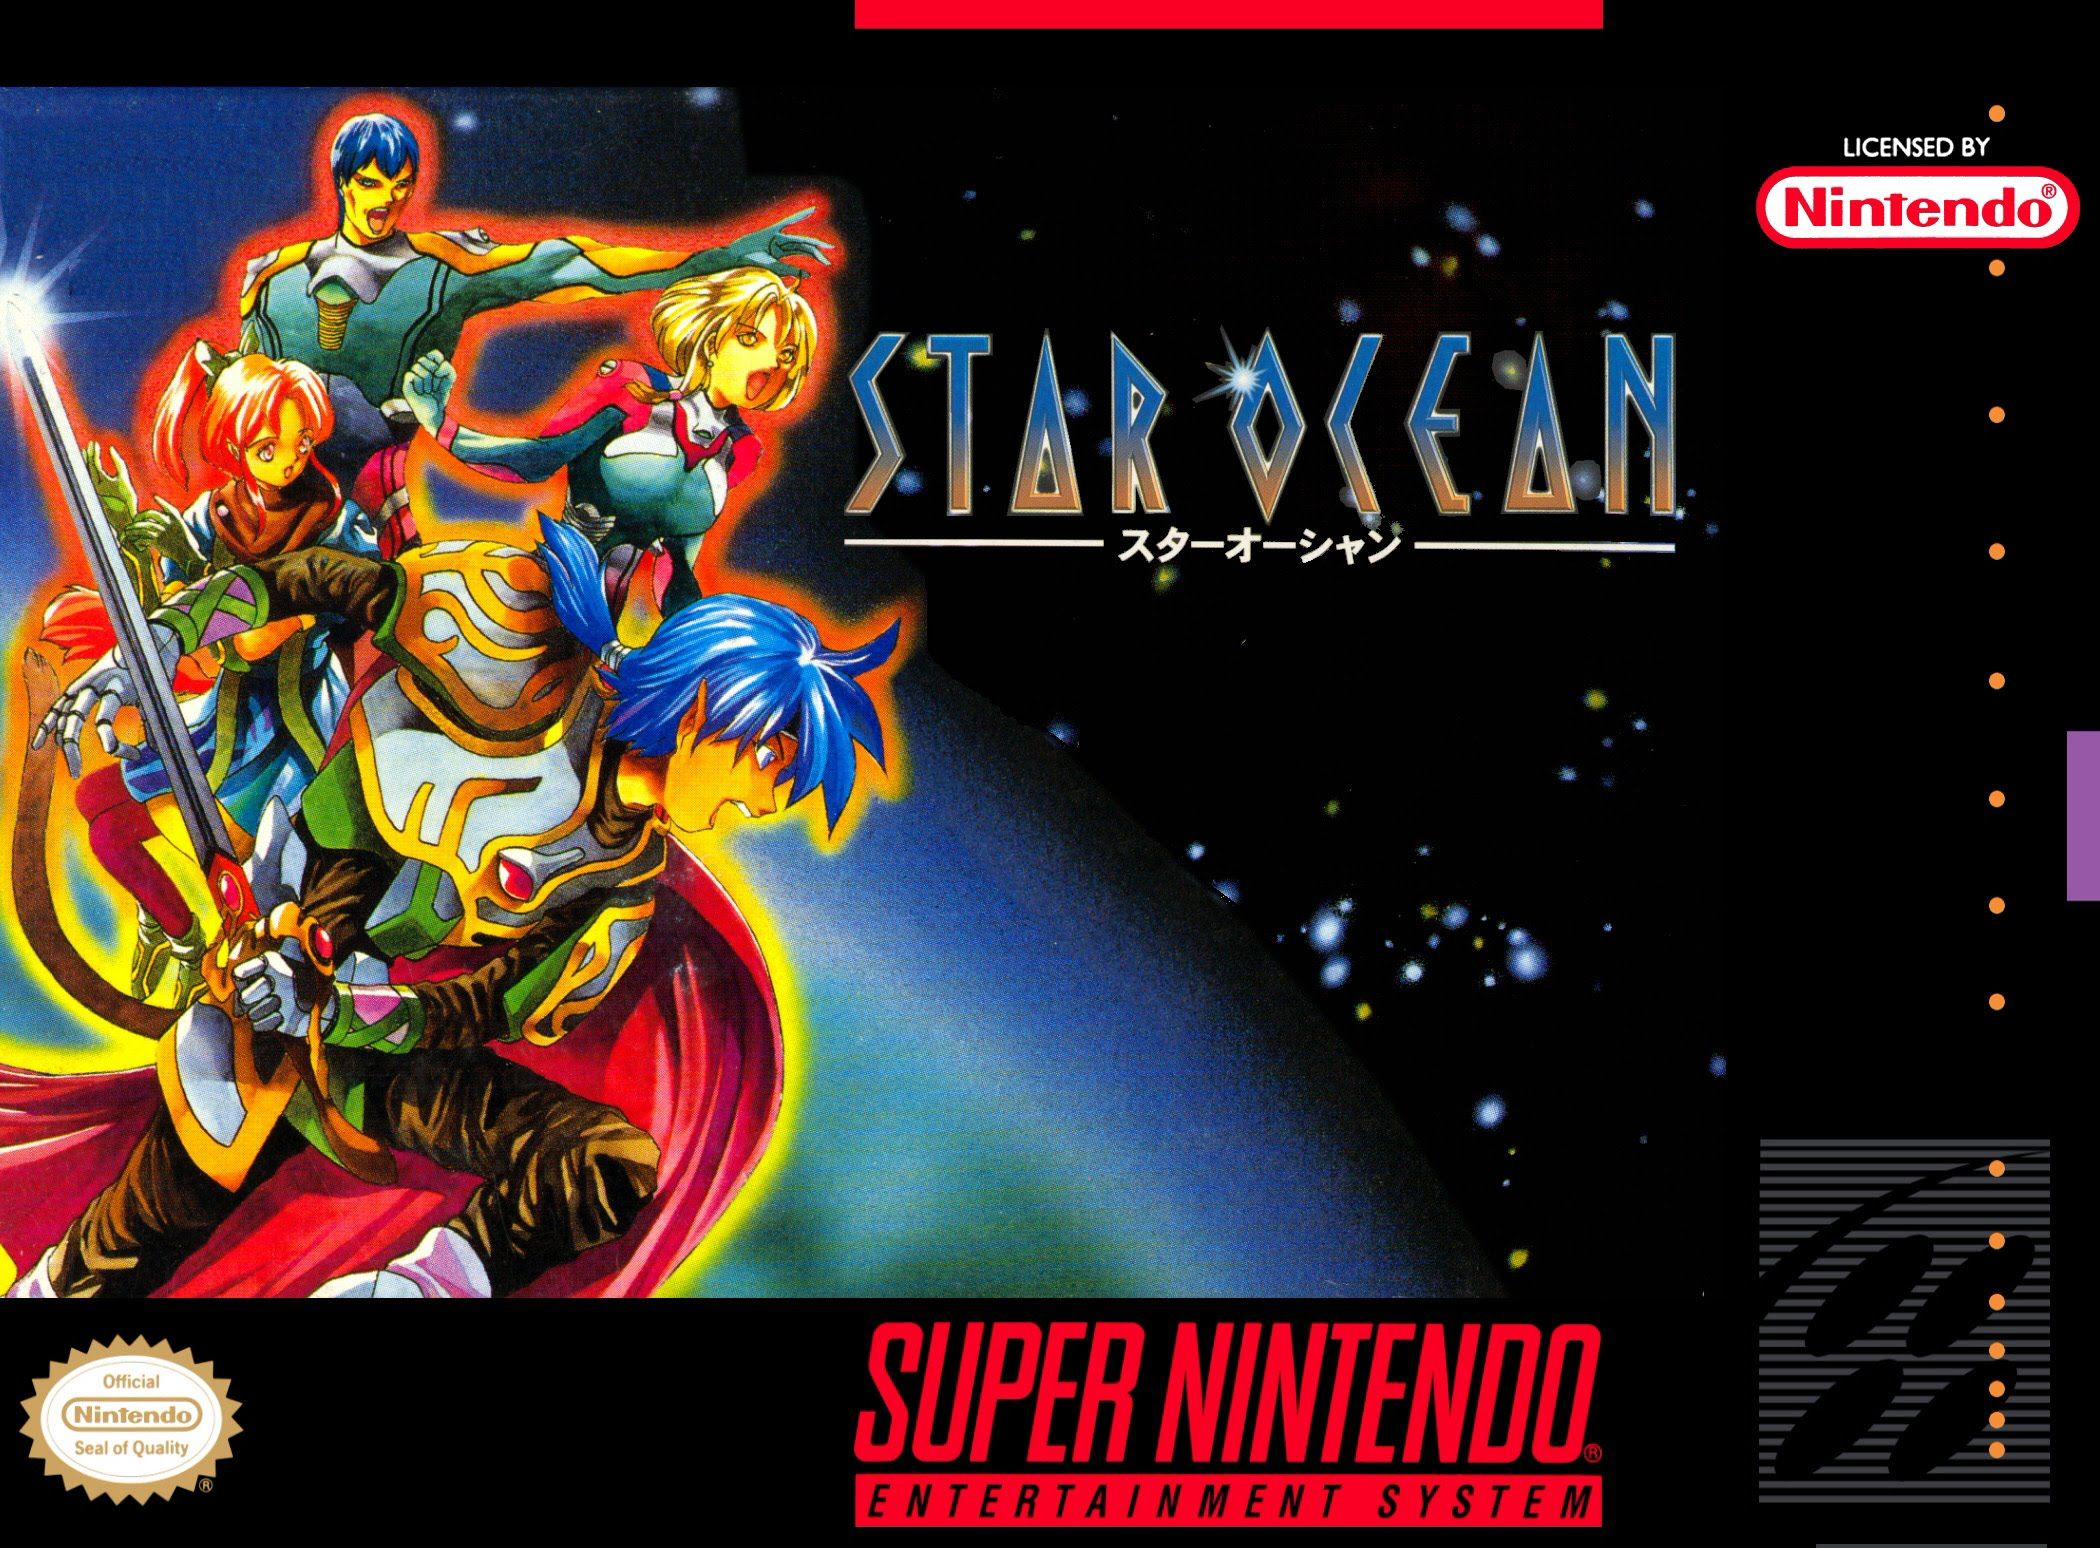 Star Ocean Snes Super Nintendo Entertainment system (super